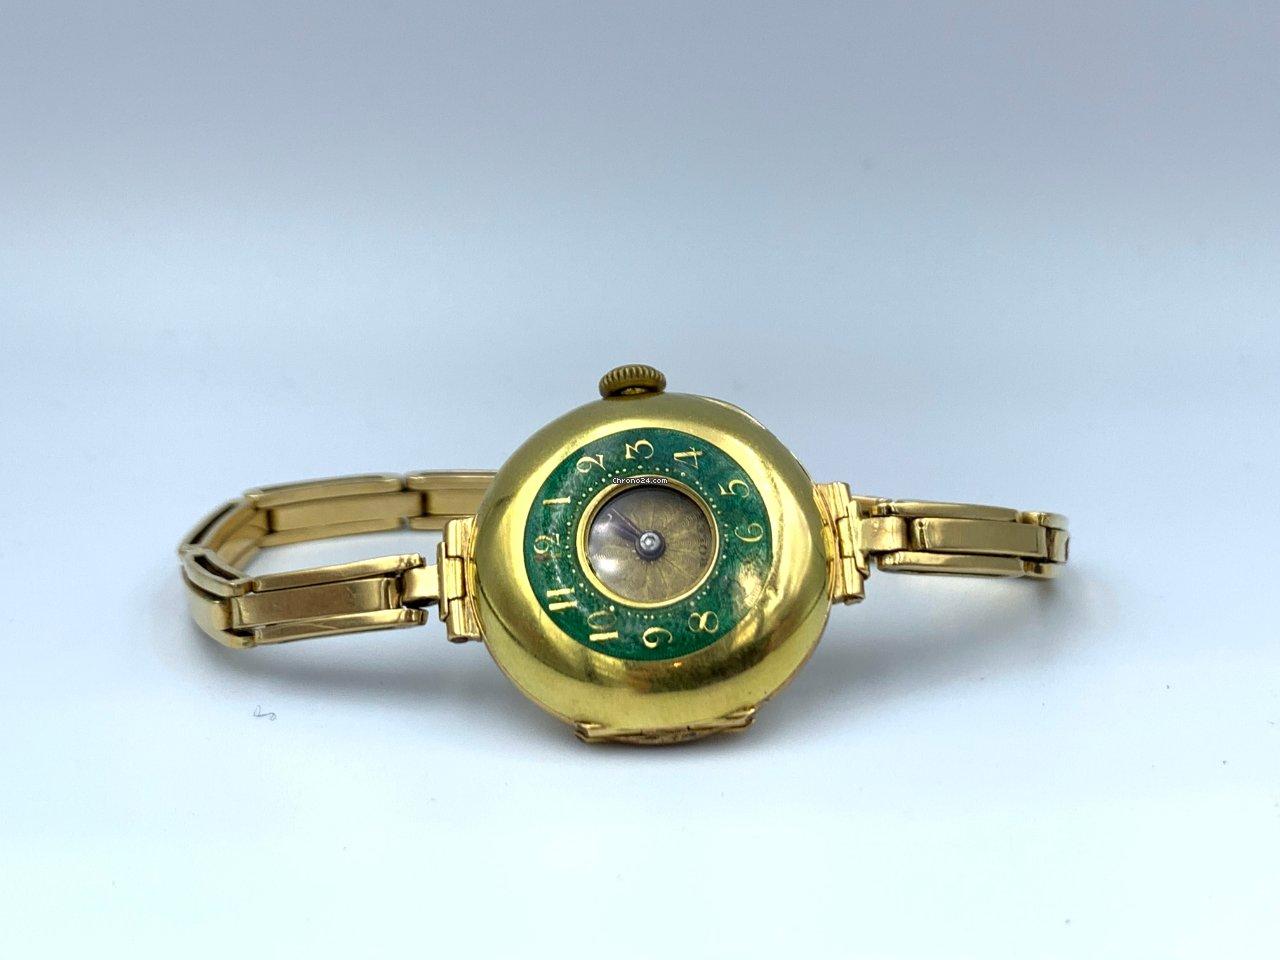 Rolex Rolex 1930 pre-owned